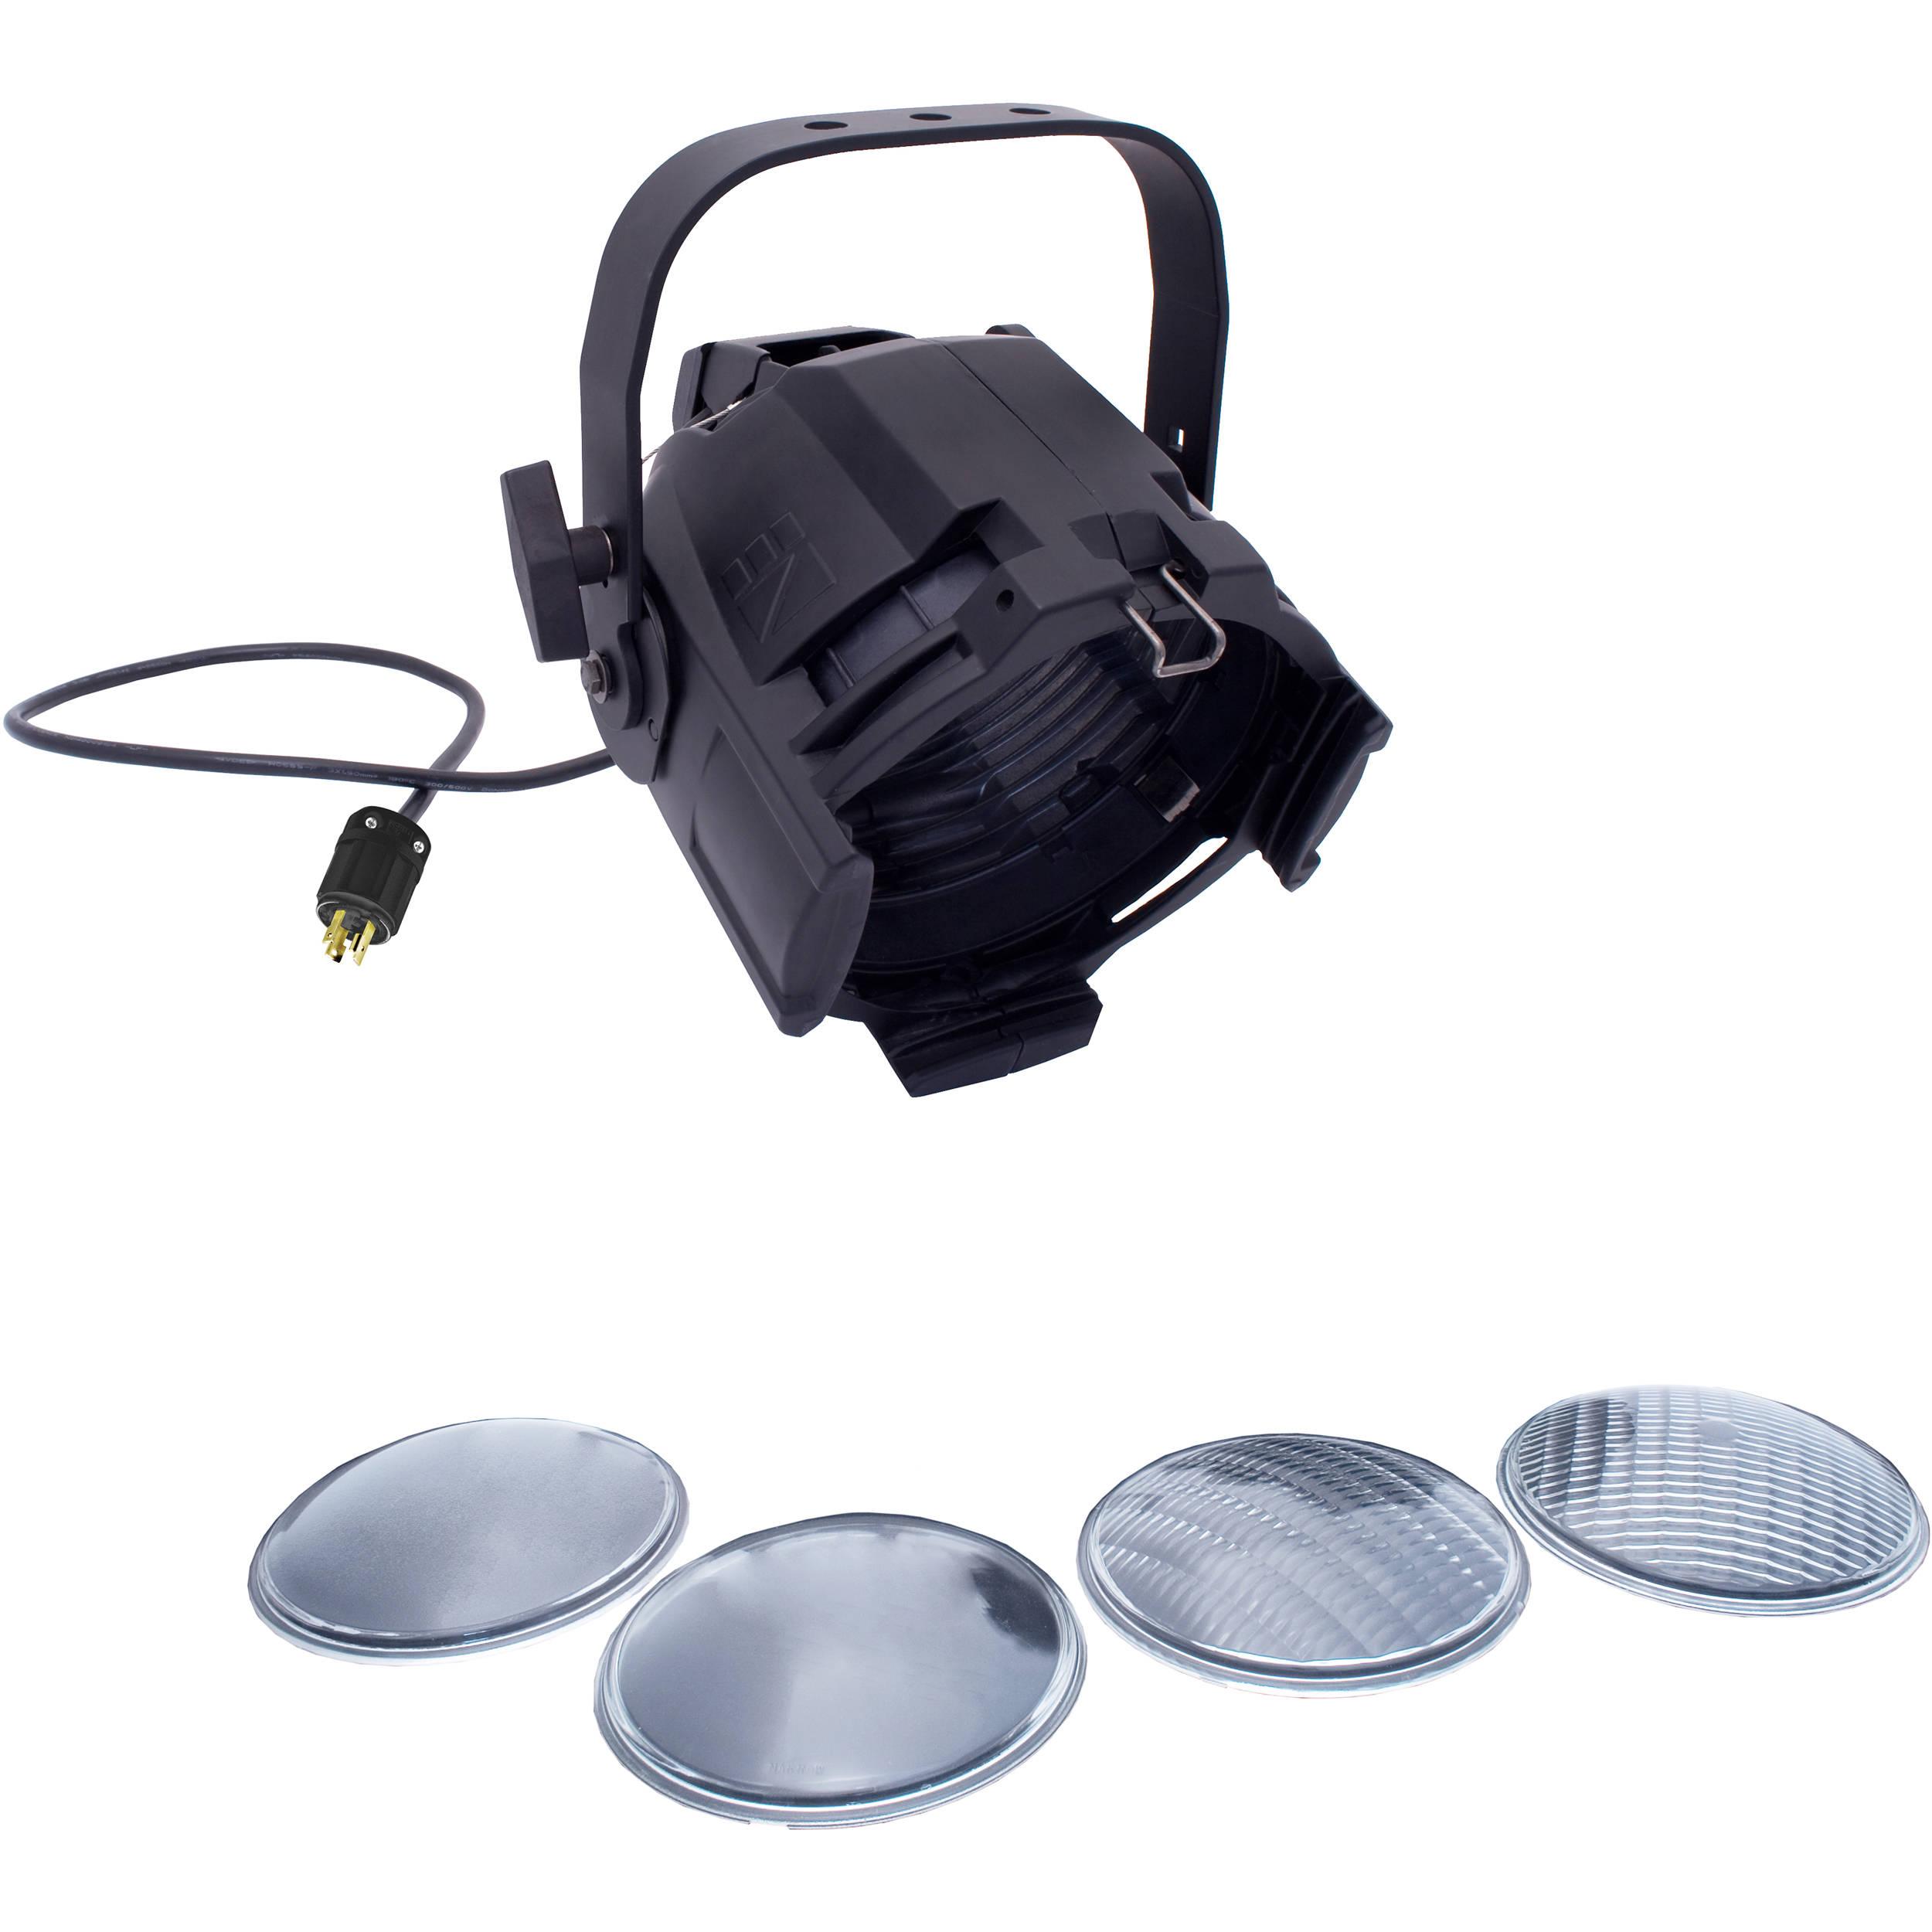 Nsi Leviton Multi Lens Par With 4 Lenses And 5 15p Parml0130pb